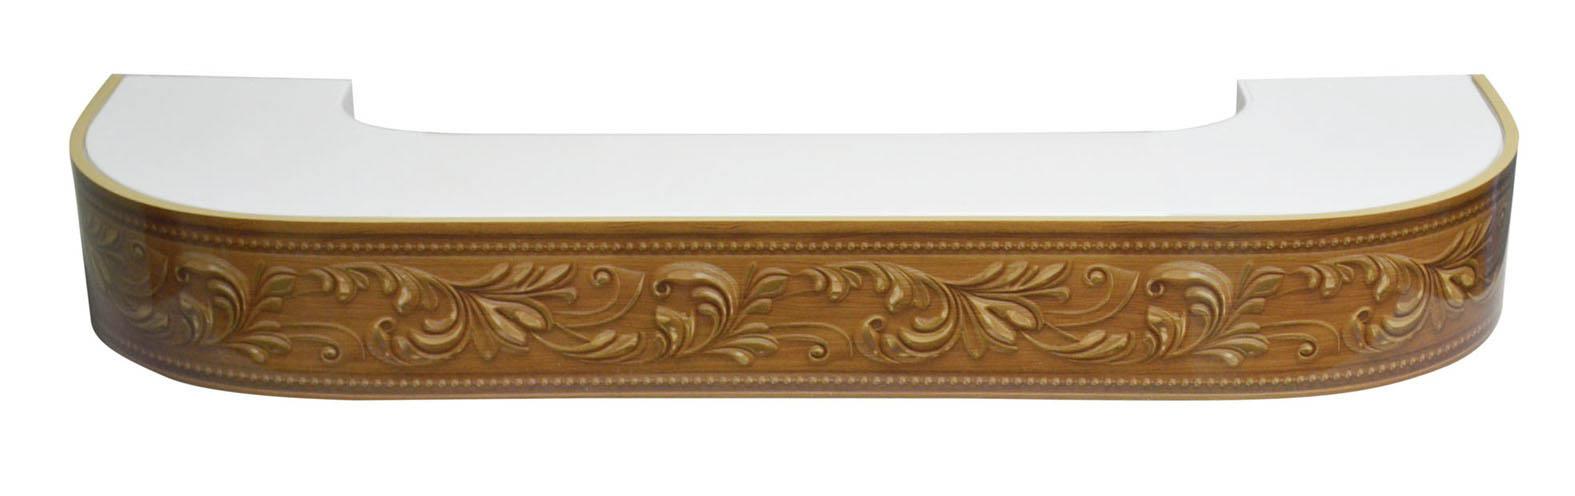 Карнизы и аксессуары для штор ARCODORO Карниз Овация Цвет: Орех (400 см)